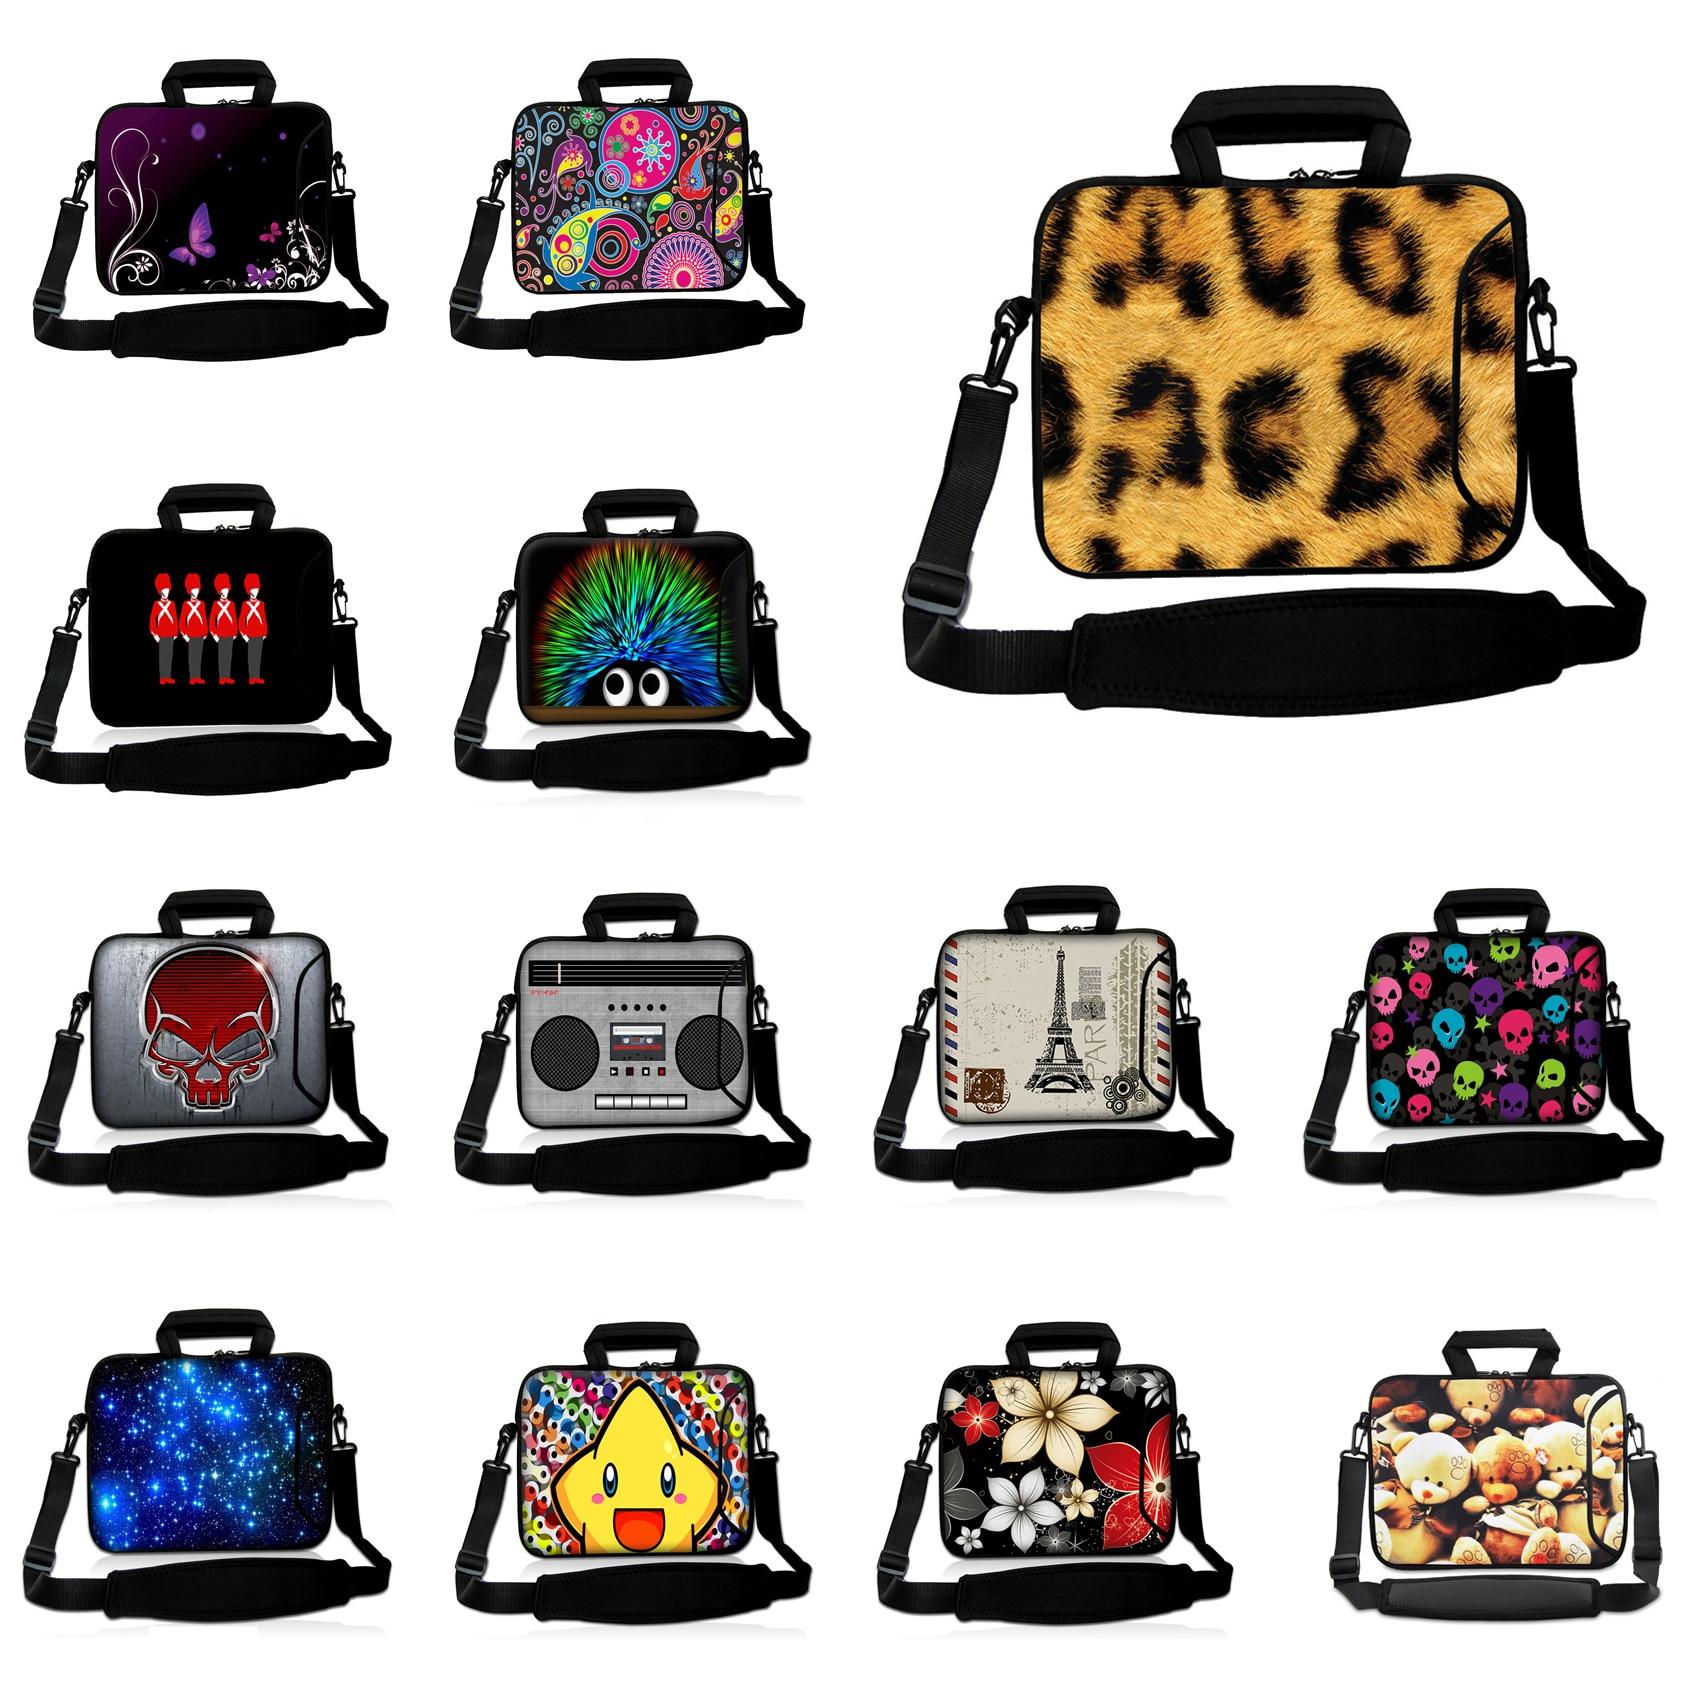 Notebook Women Bag Slim Briefcase Computer Shoulder Messenger Bag 15.6 Cheap Laptop Neoprene Bags 15 15.4 Handbag For Macbook